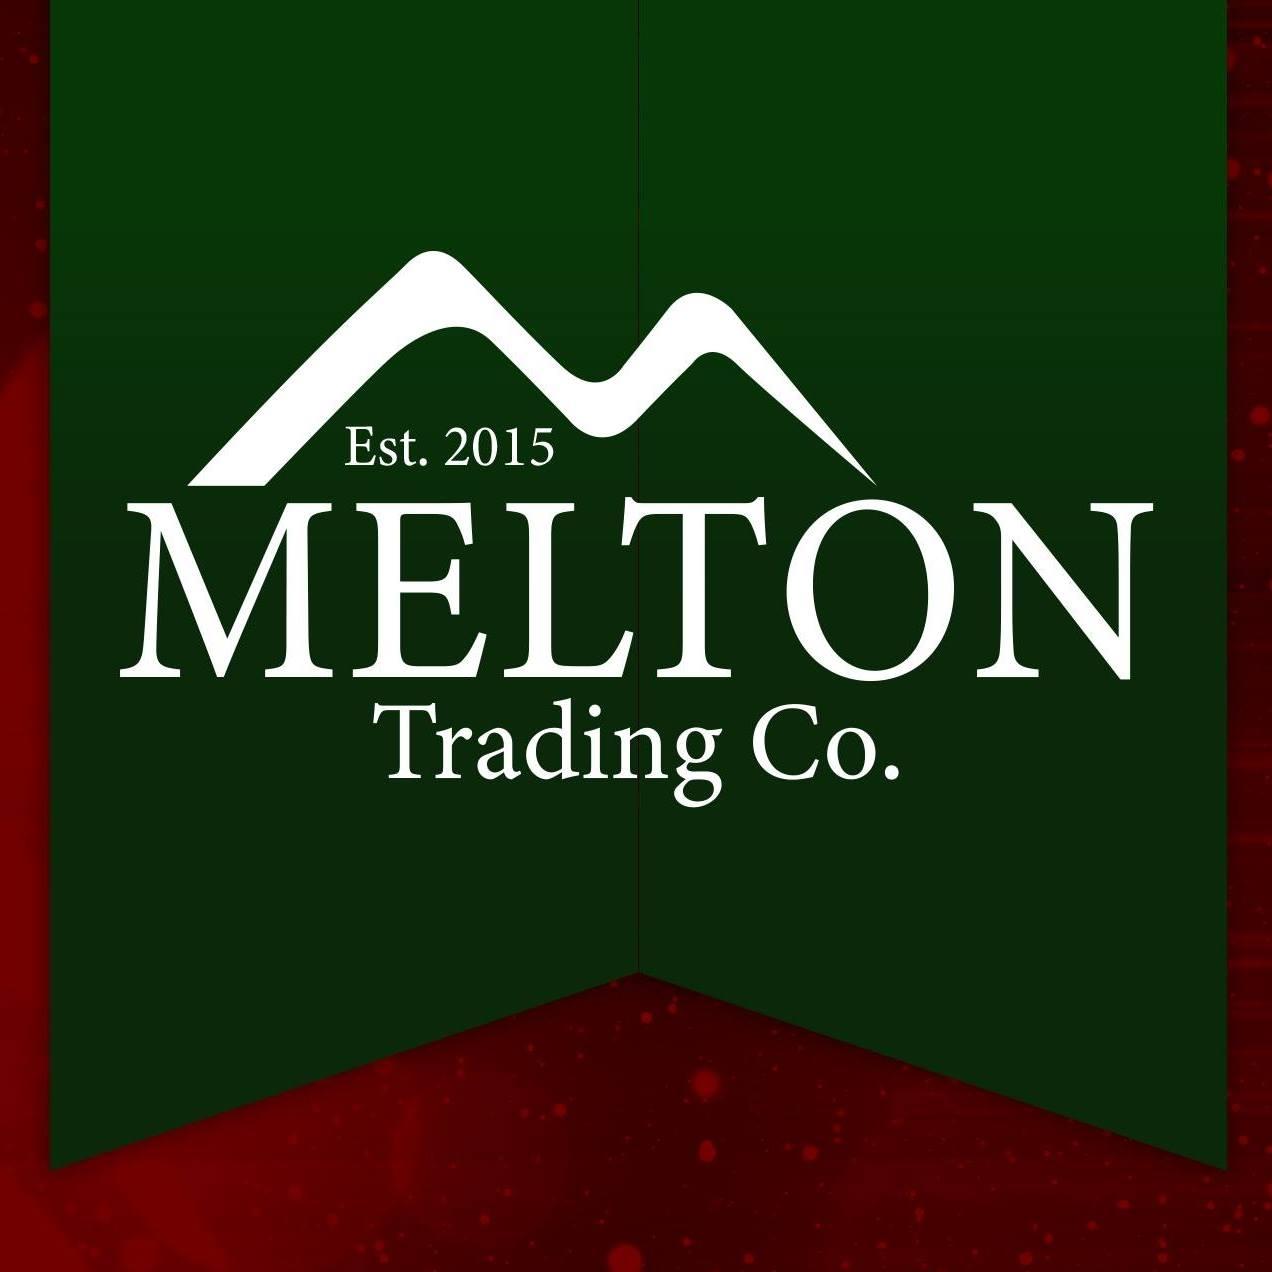 Melton Trading Co